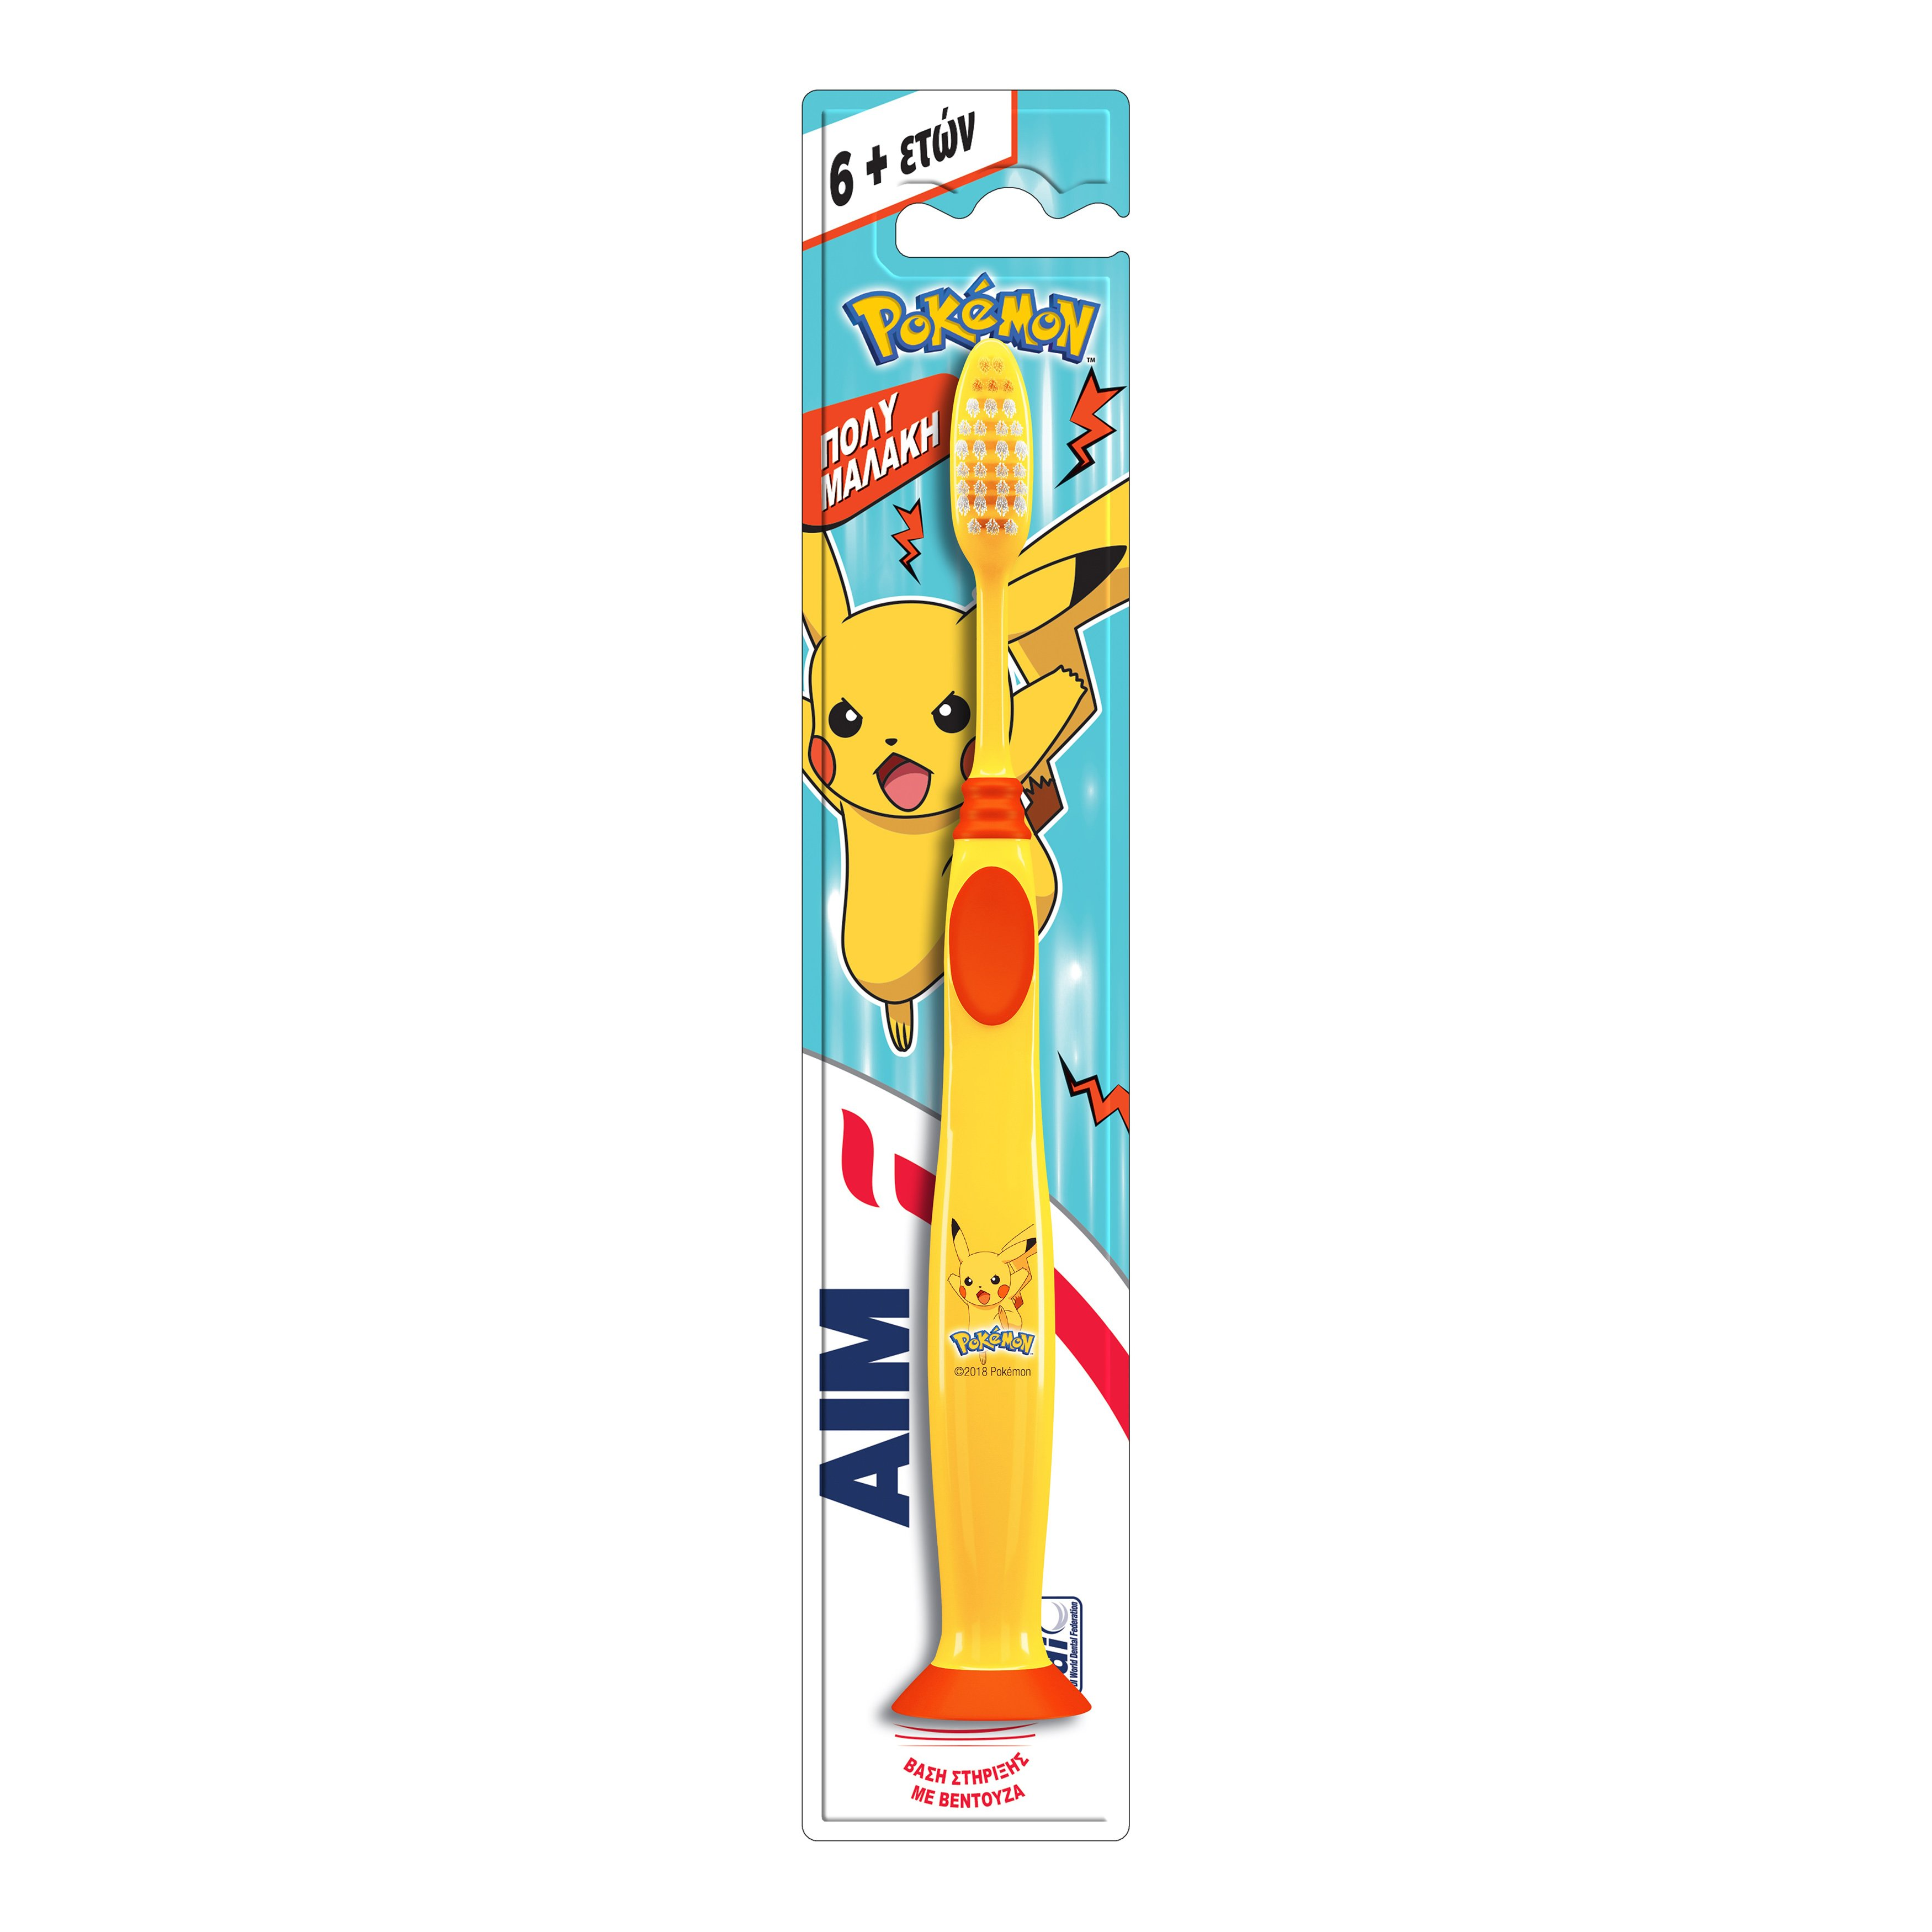 Aim Kids Pokemon Soft Παιδική Οδοντόβουρτσα Πολύ Μαλακή με Βάση Στήριξης με Βεντούζα 6+ Ετών 1 Τεμάχιο – κίτρινο